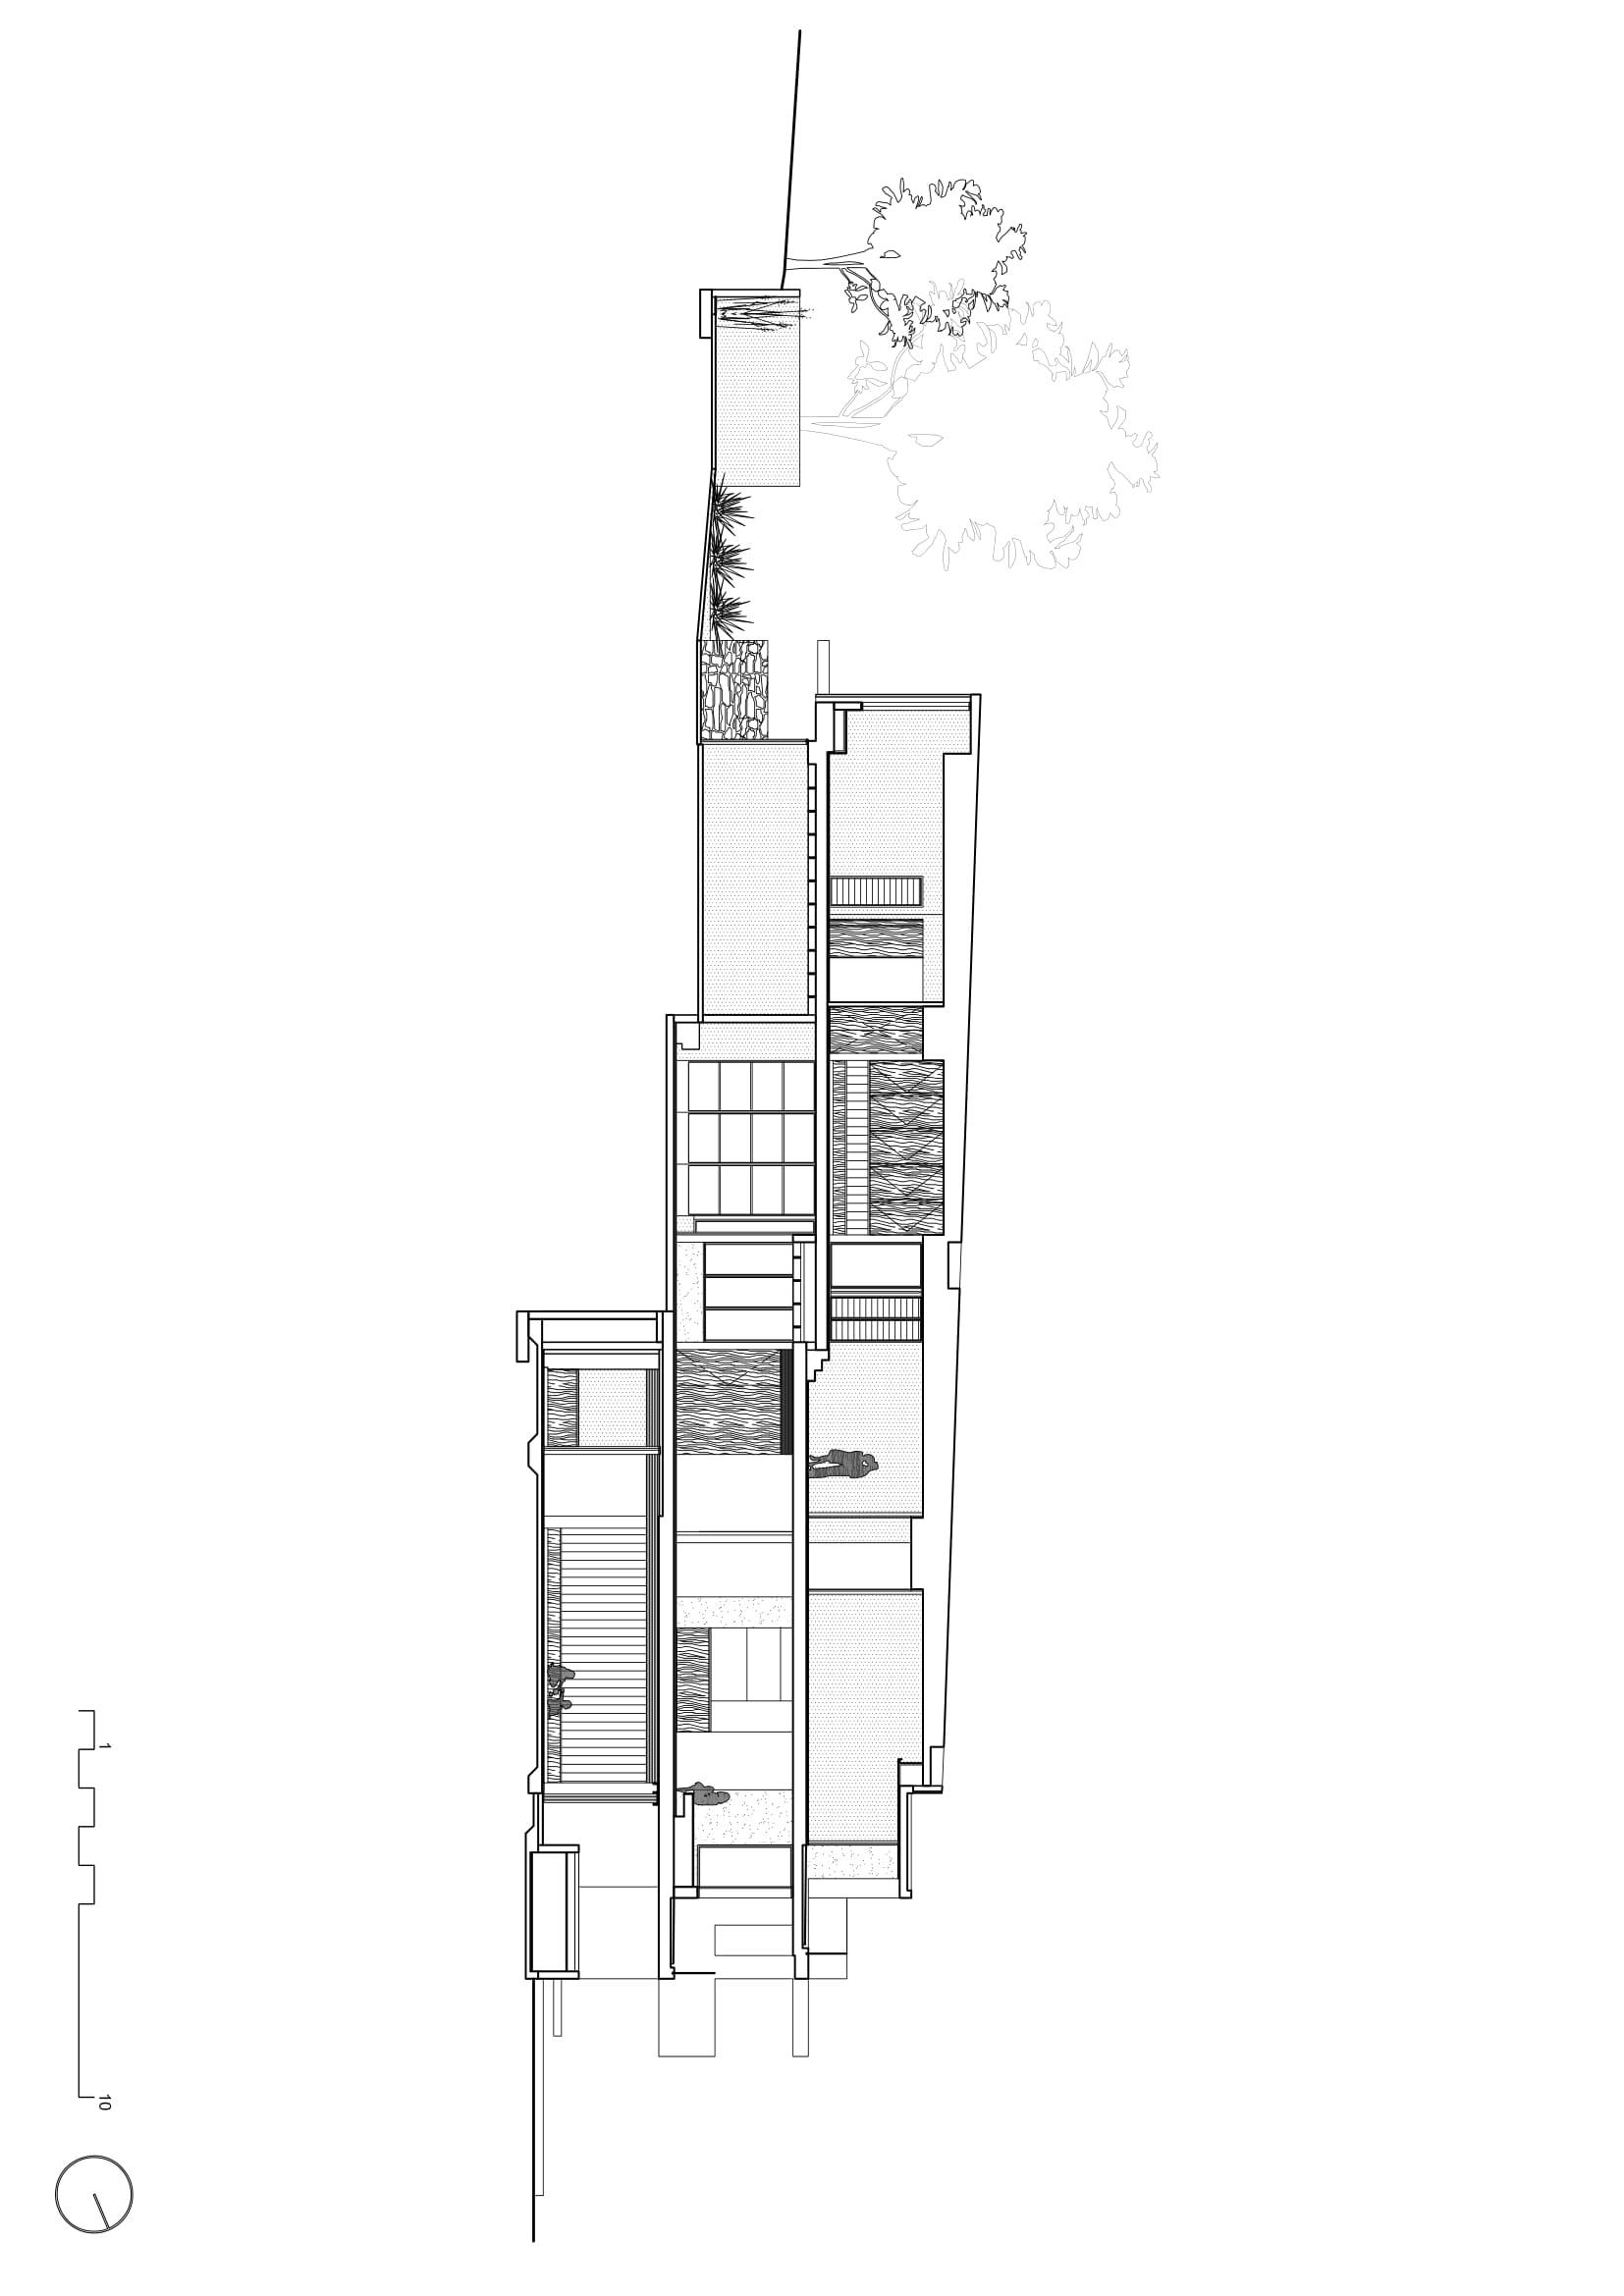 Gallery Of Mosman House By Shaun Lockyer Architects Local Australian Design And Interiors Mosman, Nsw Image 23